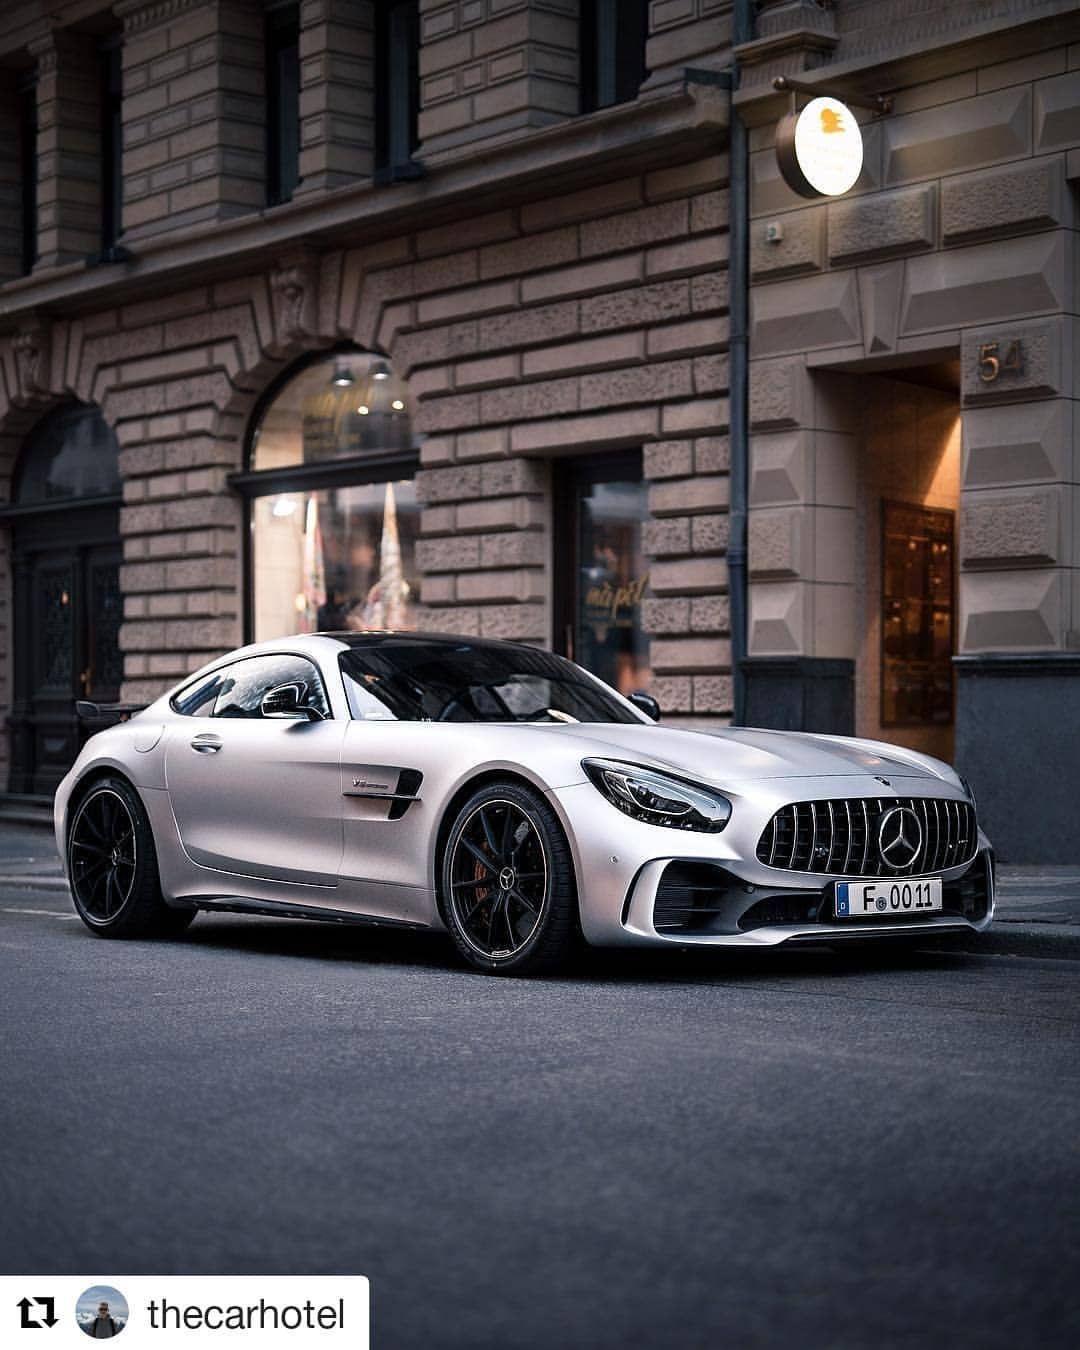 Amazing Cars And Drives On Instagram Mercedesbenz Mbsocialcar Mercedes Amg Mercedesamg In 2020 Mercedes Car Mercedes Benz Amg 4 Door Sports Cars